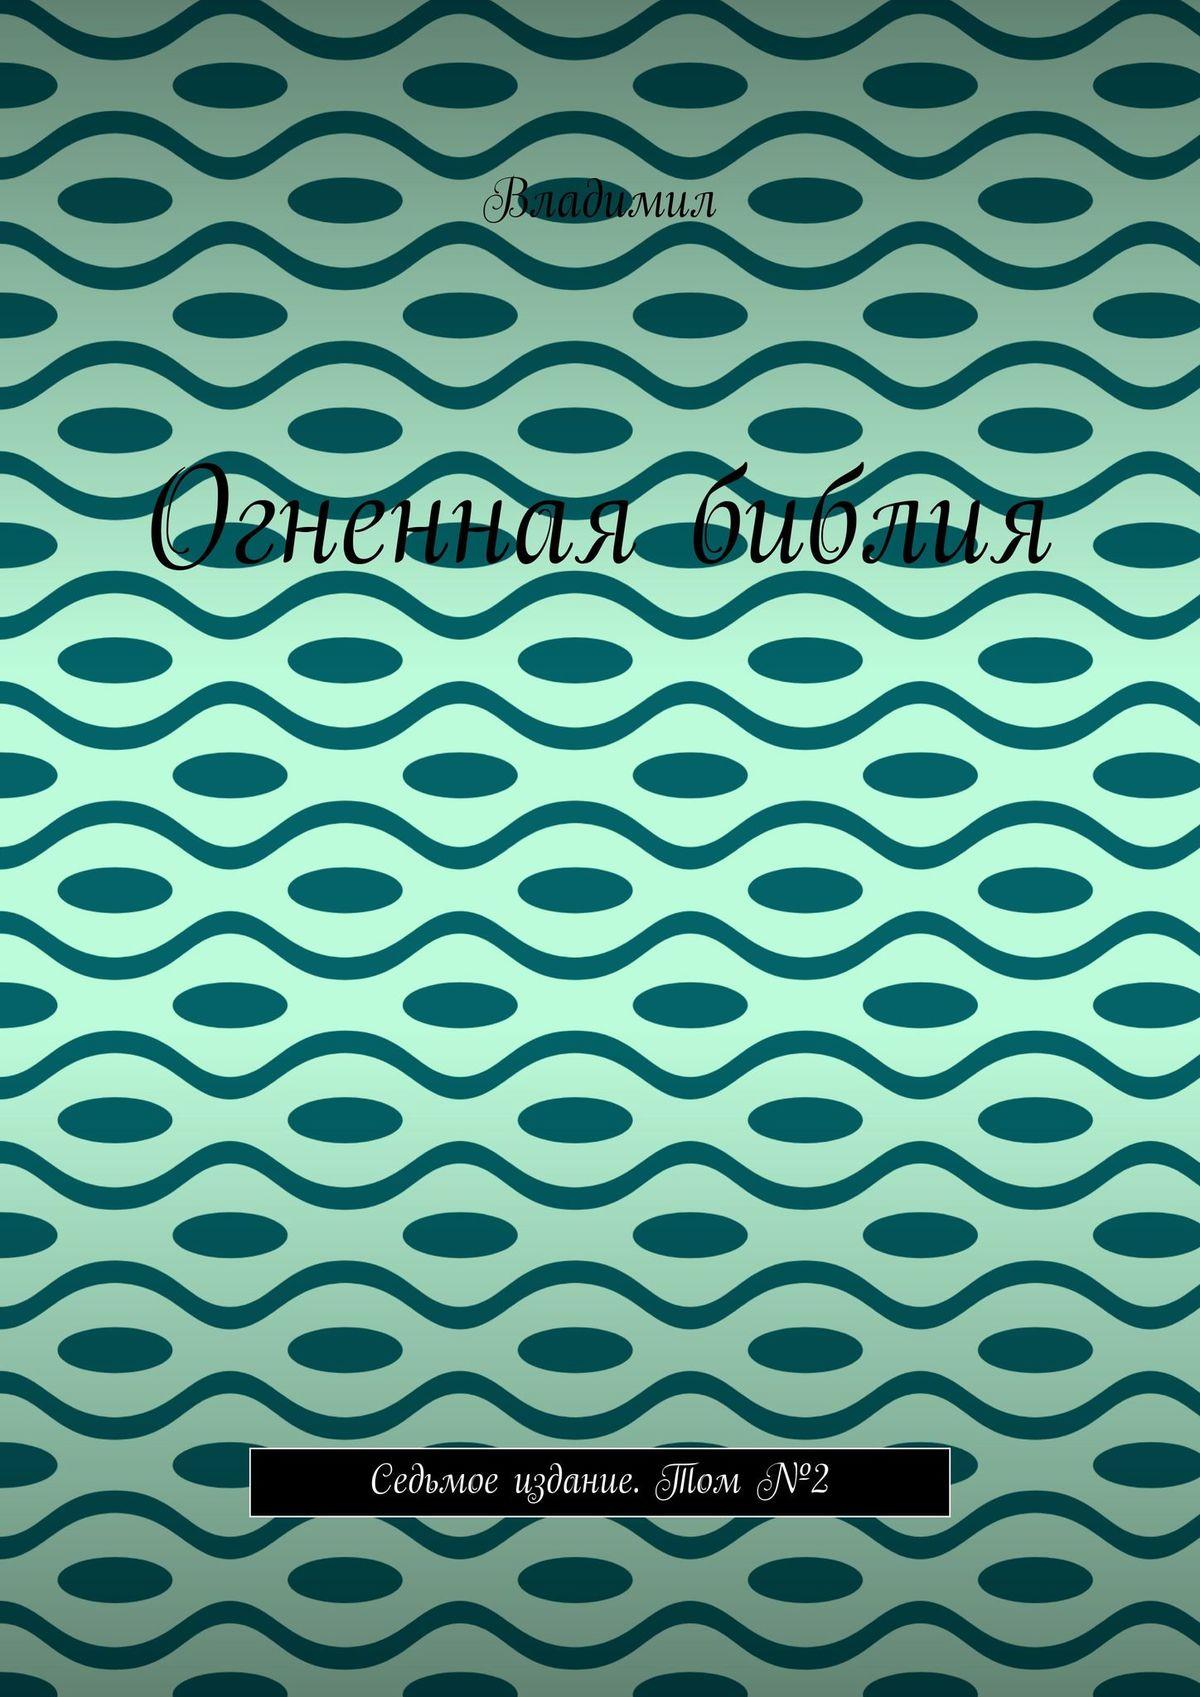 Владимил Огненная библия. Седьмое издание. Том№2 deep v one piece swimsuit push up swimwear lace sexy women monokini bodysuit 2017 beach floral mesh bathing suit maillot de bain